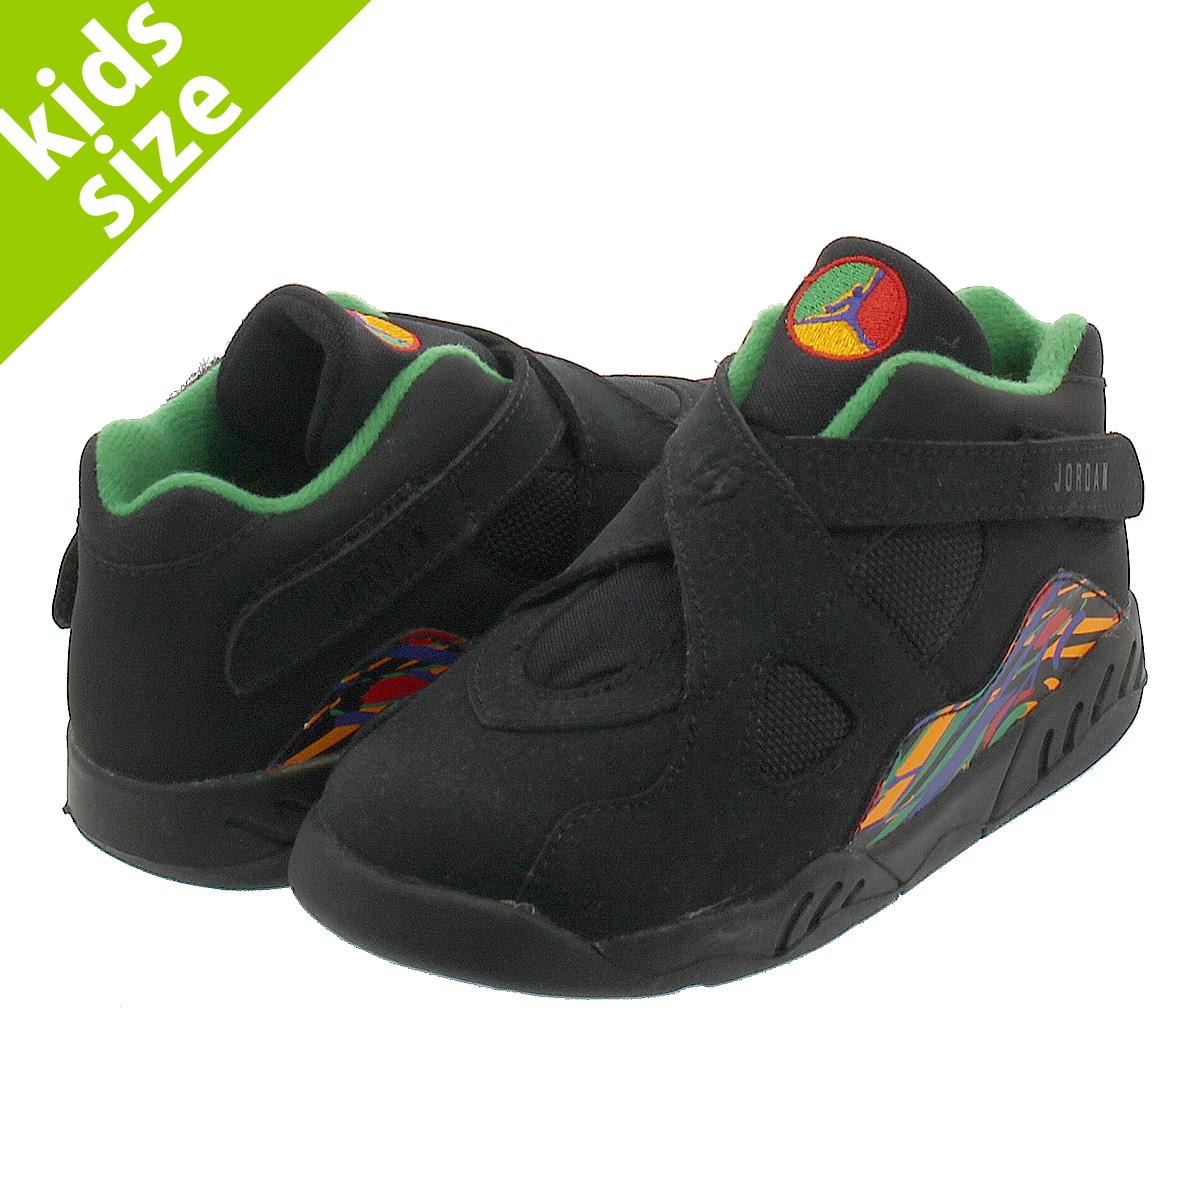 best service 7cb03 4263e NIKE AIR JORDAN 8 RETRO BT Nike Air Jordan 8 nostalgic BT BLACK/LIGHT  CONCORD/ALOE VERDE 305,360-004